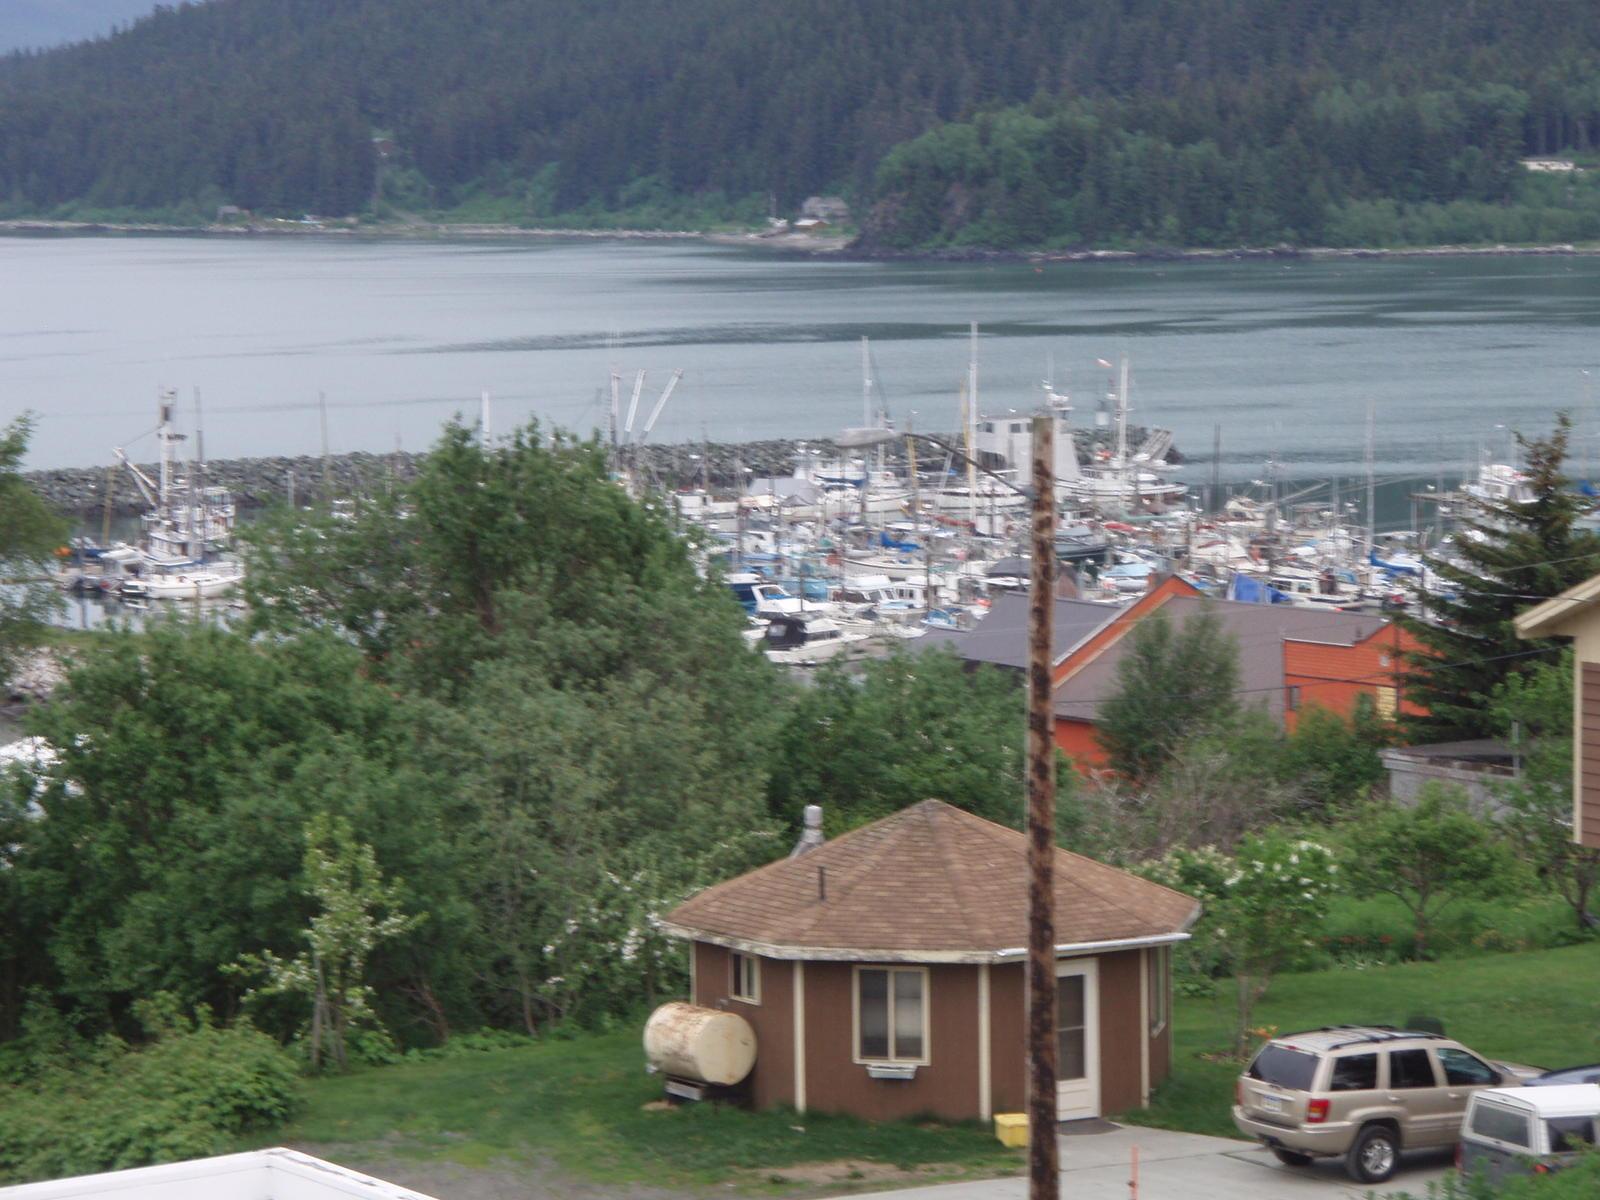 Alaska haines county -  Haines Alaska Haines Small Boat Harbor Jpg